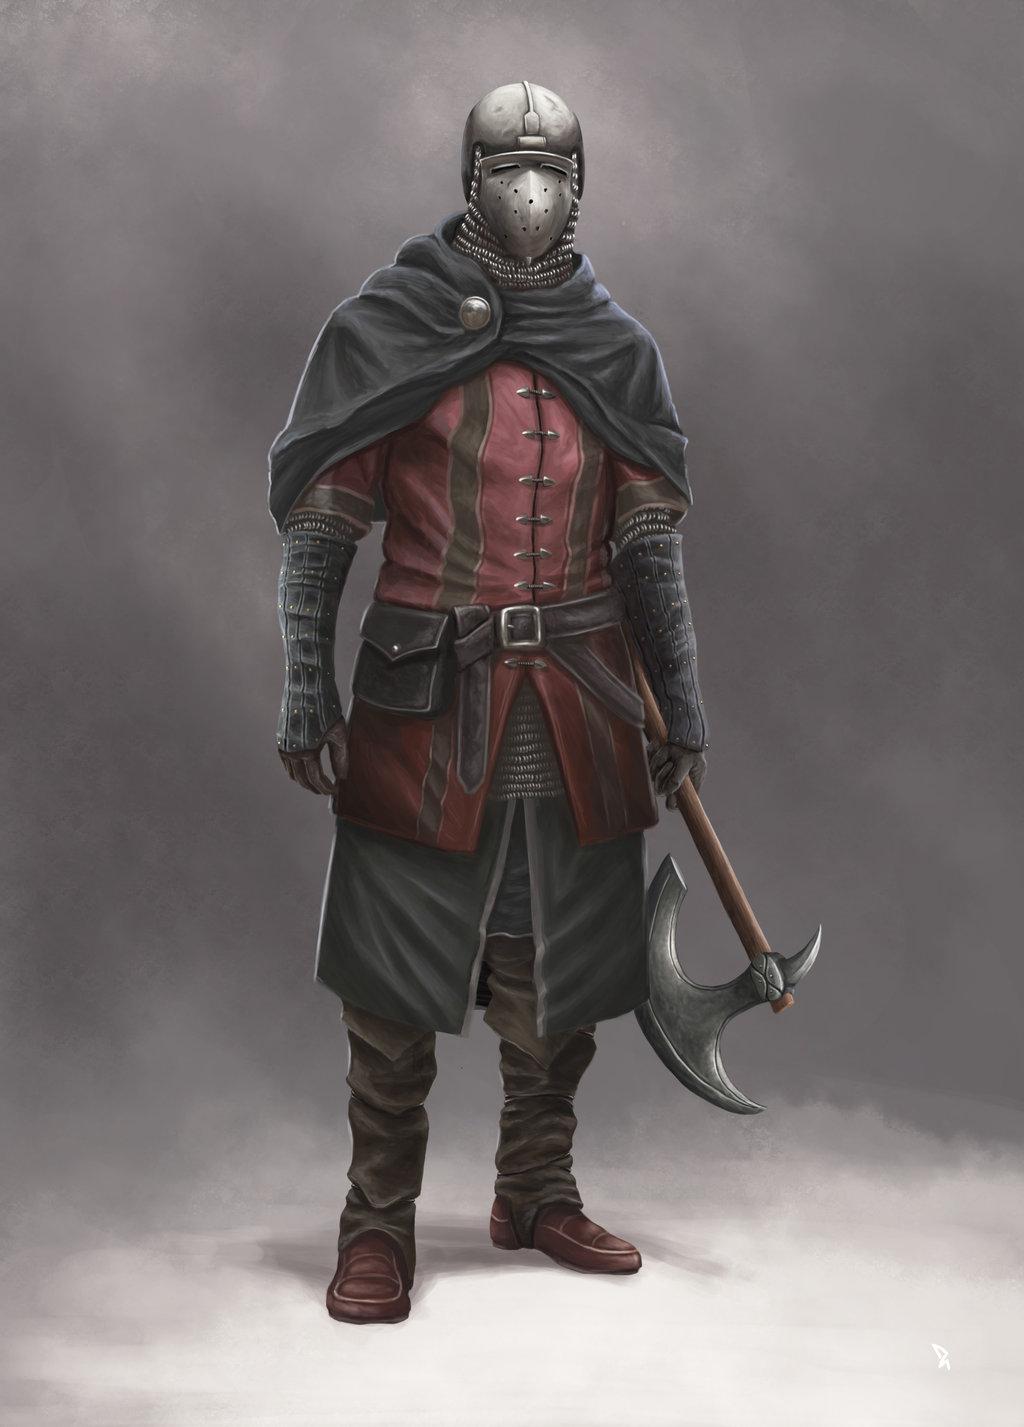 guard_by_karehb-d41a2qf.jpg